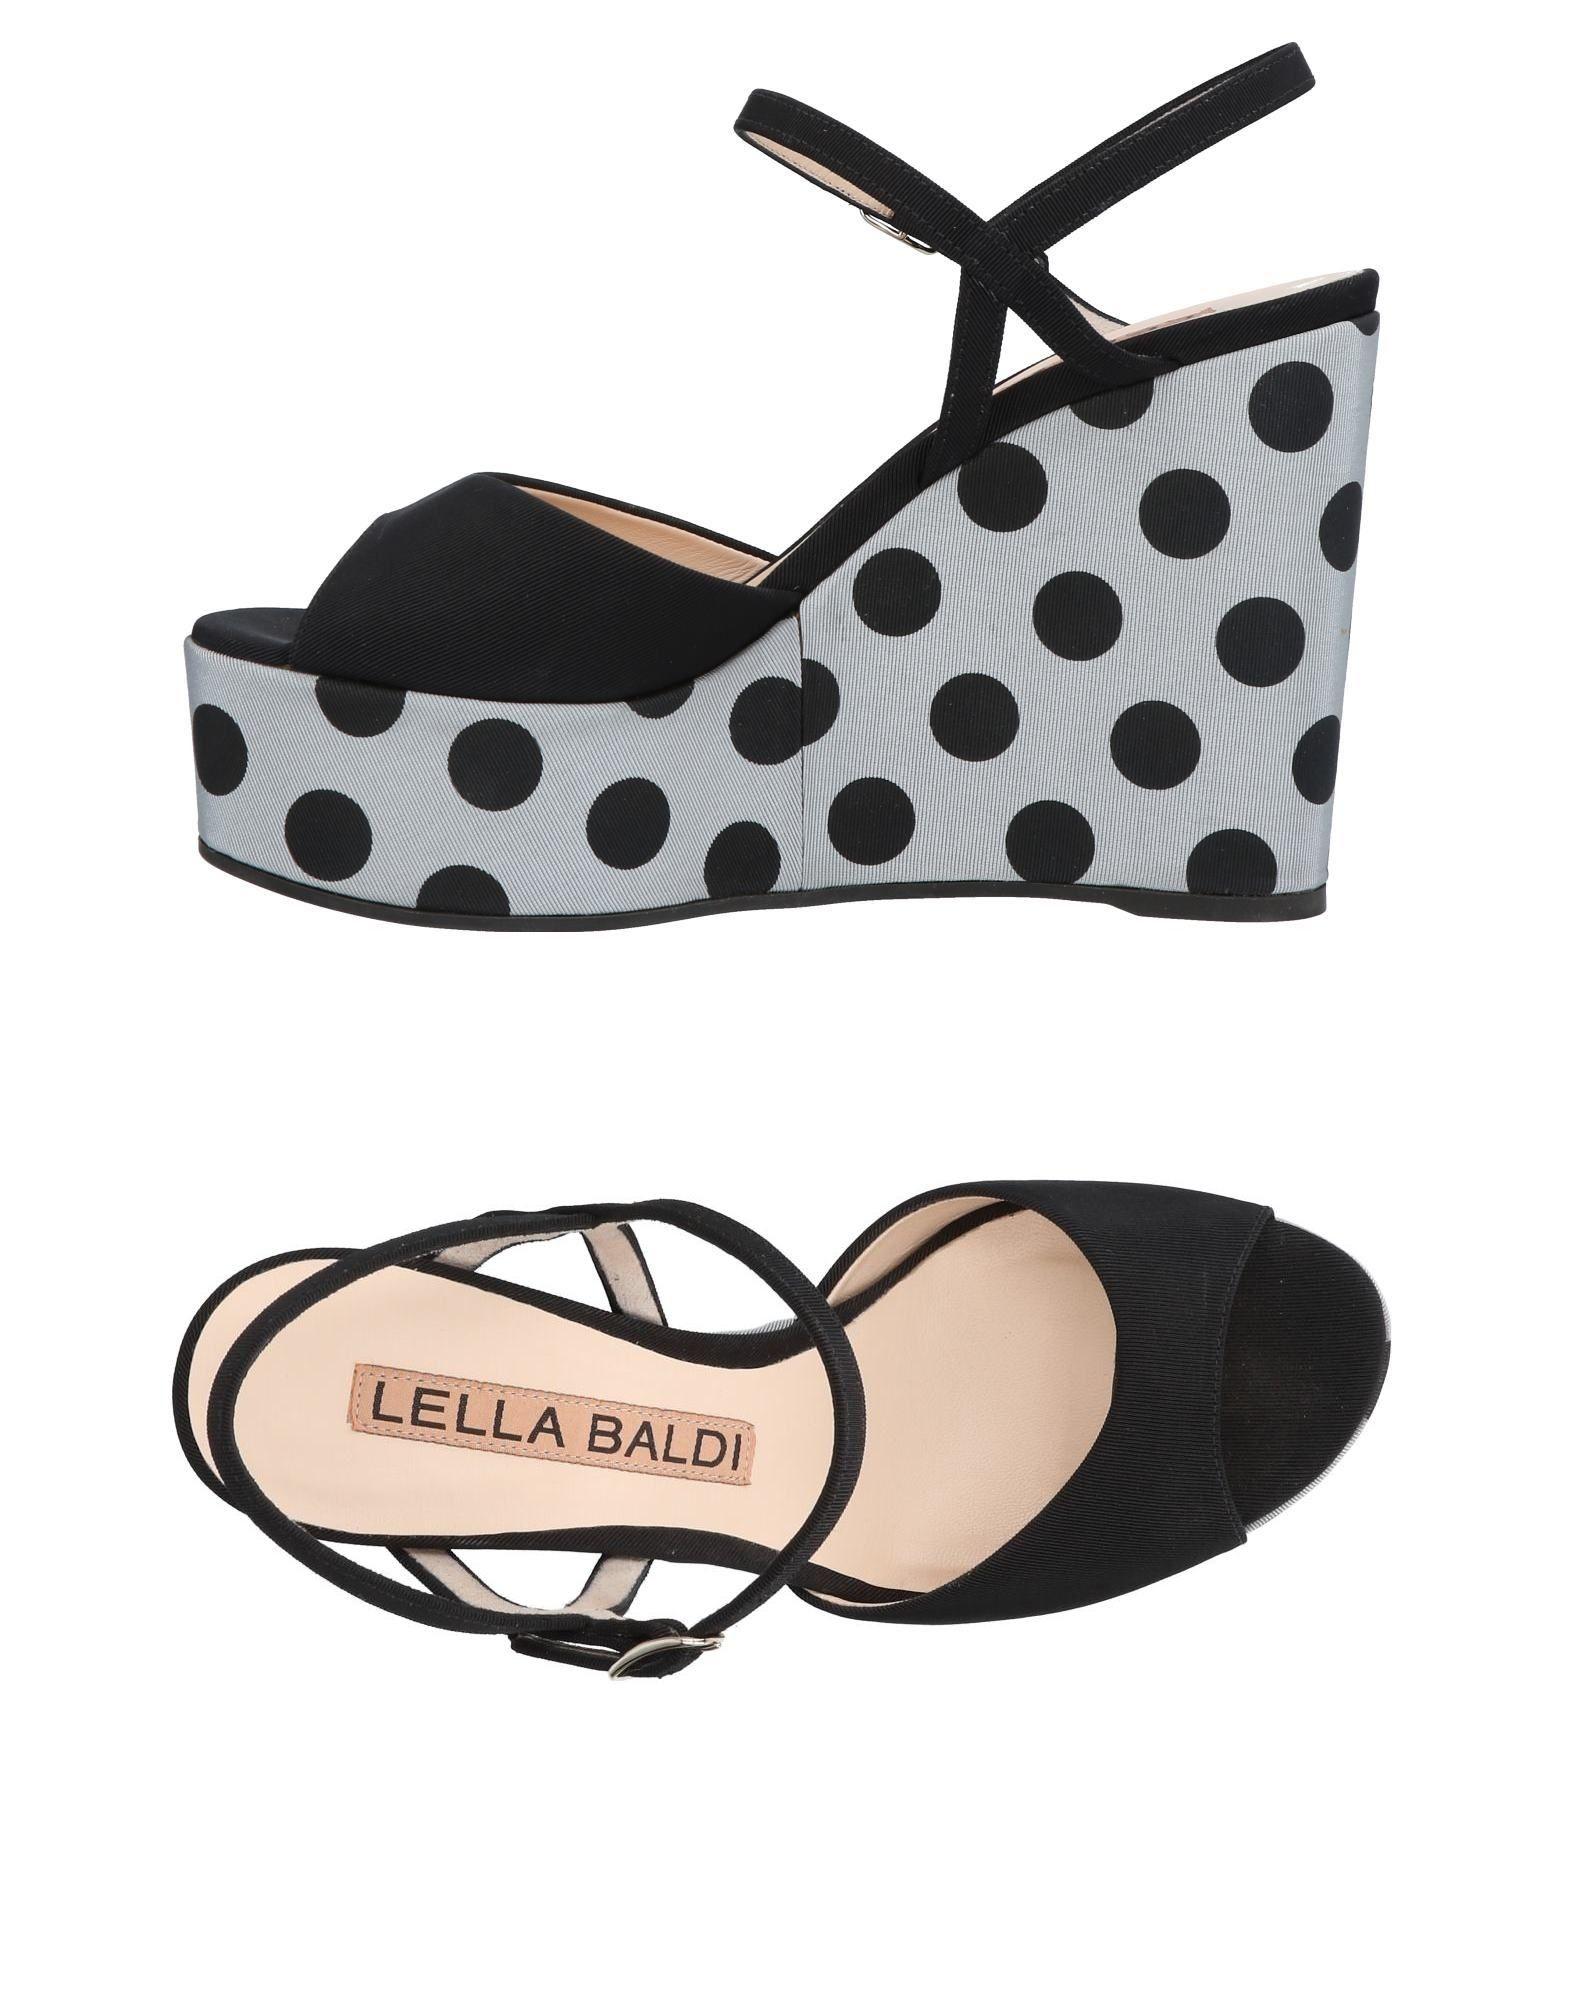 Lella Baldi Sandalen Damen  11416123DW Gute Qualität beliebte Schuhe